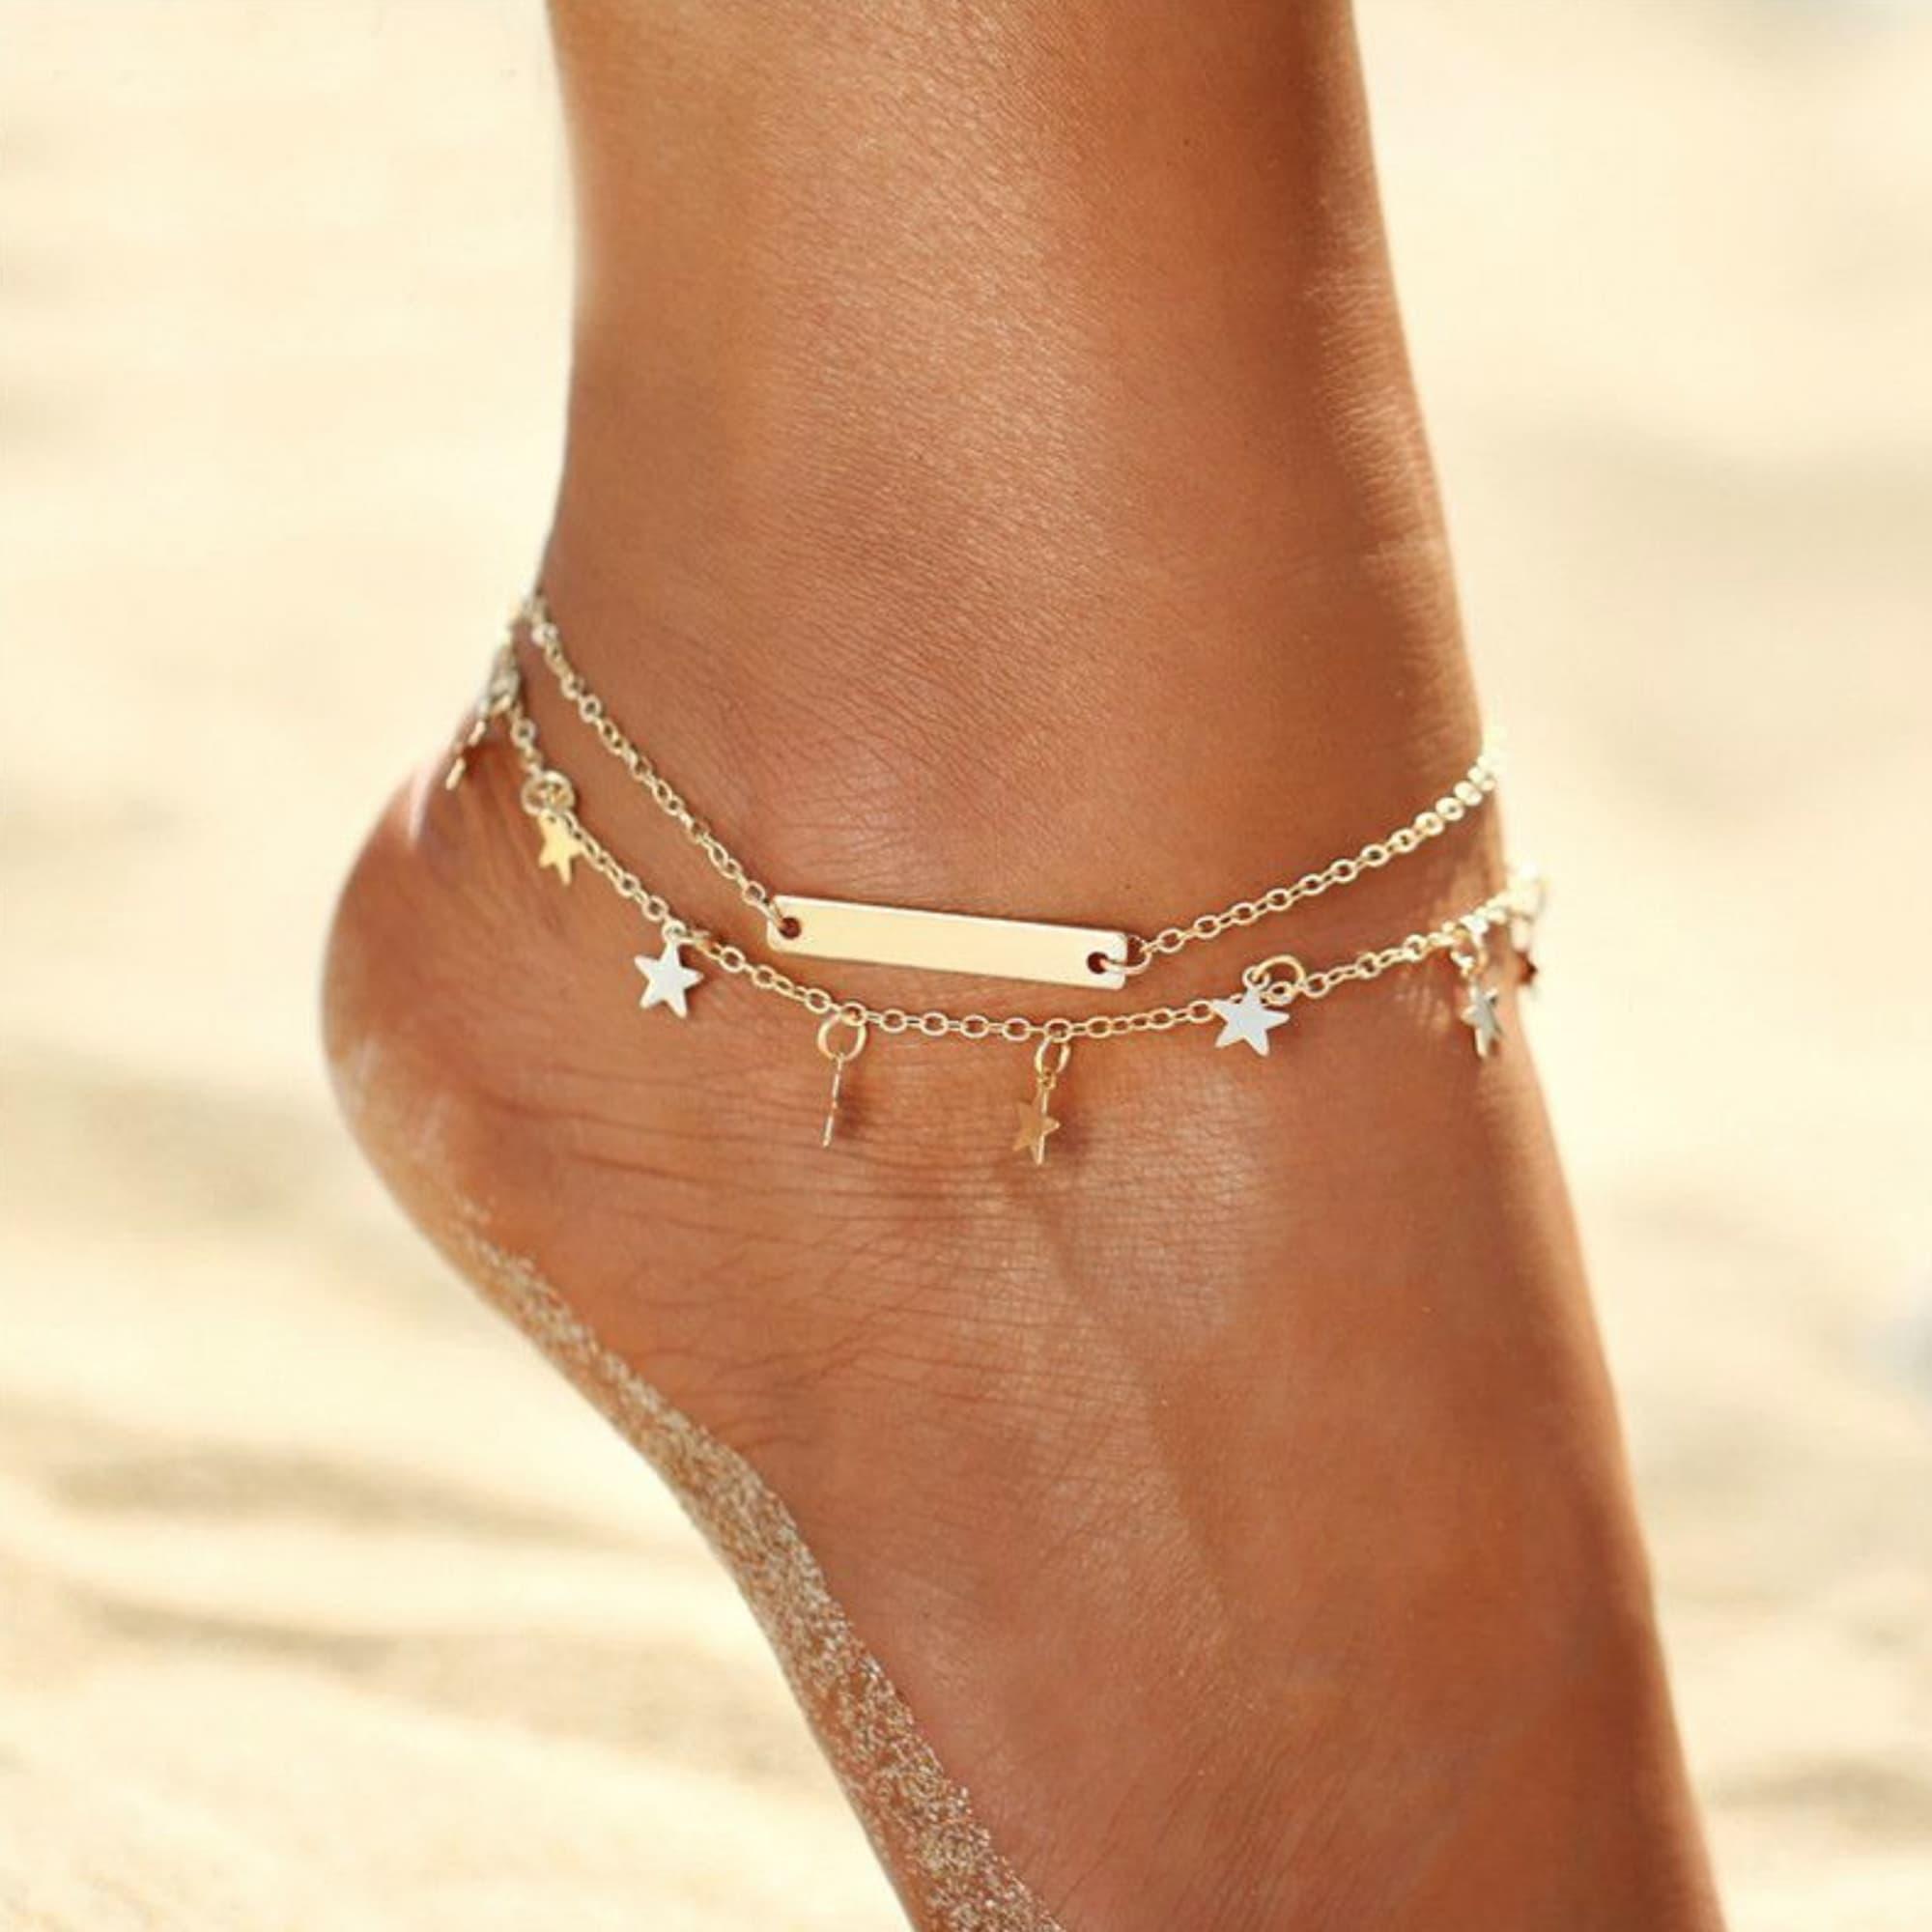 bd8af67d3 Dámska móda a doplnky - Dvojitý náramok na nohu Star ...